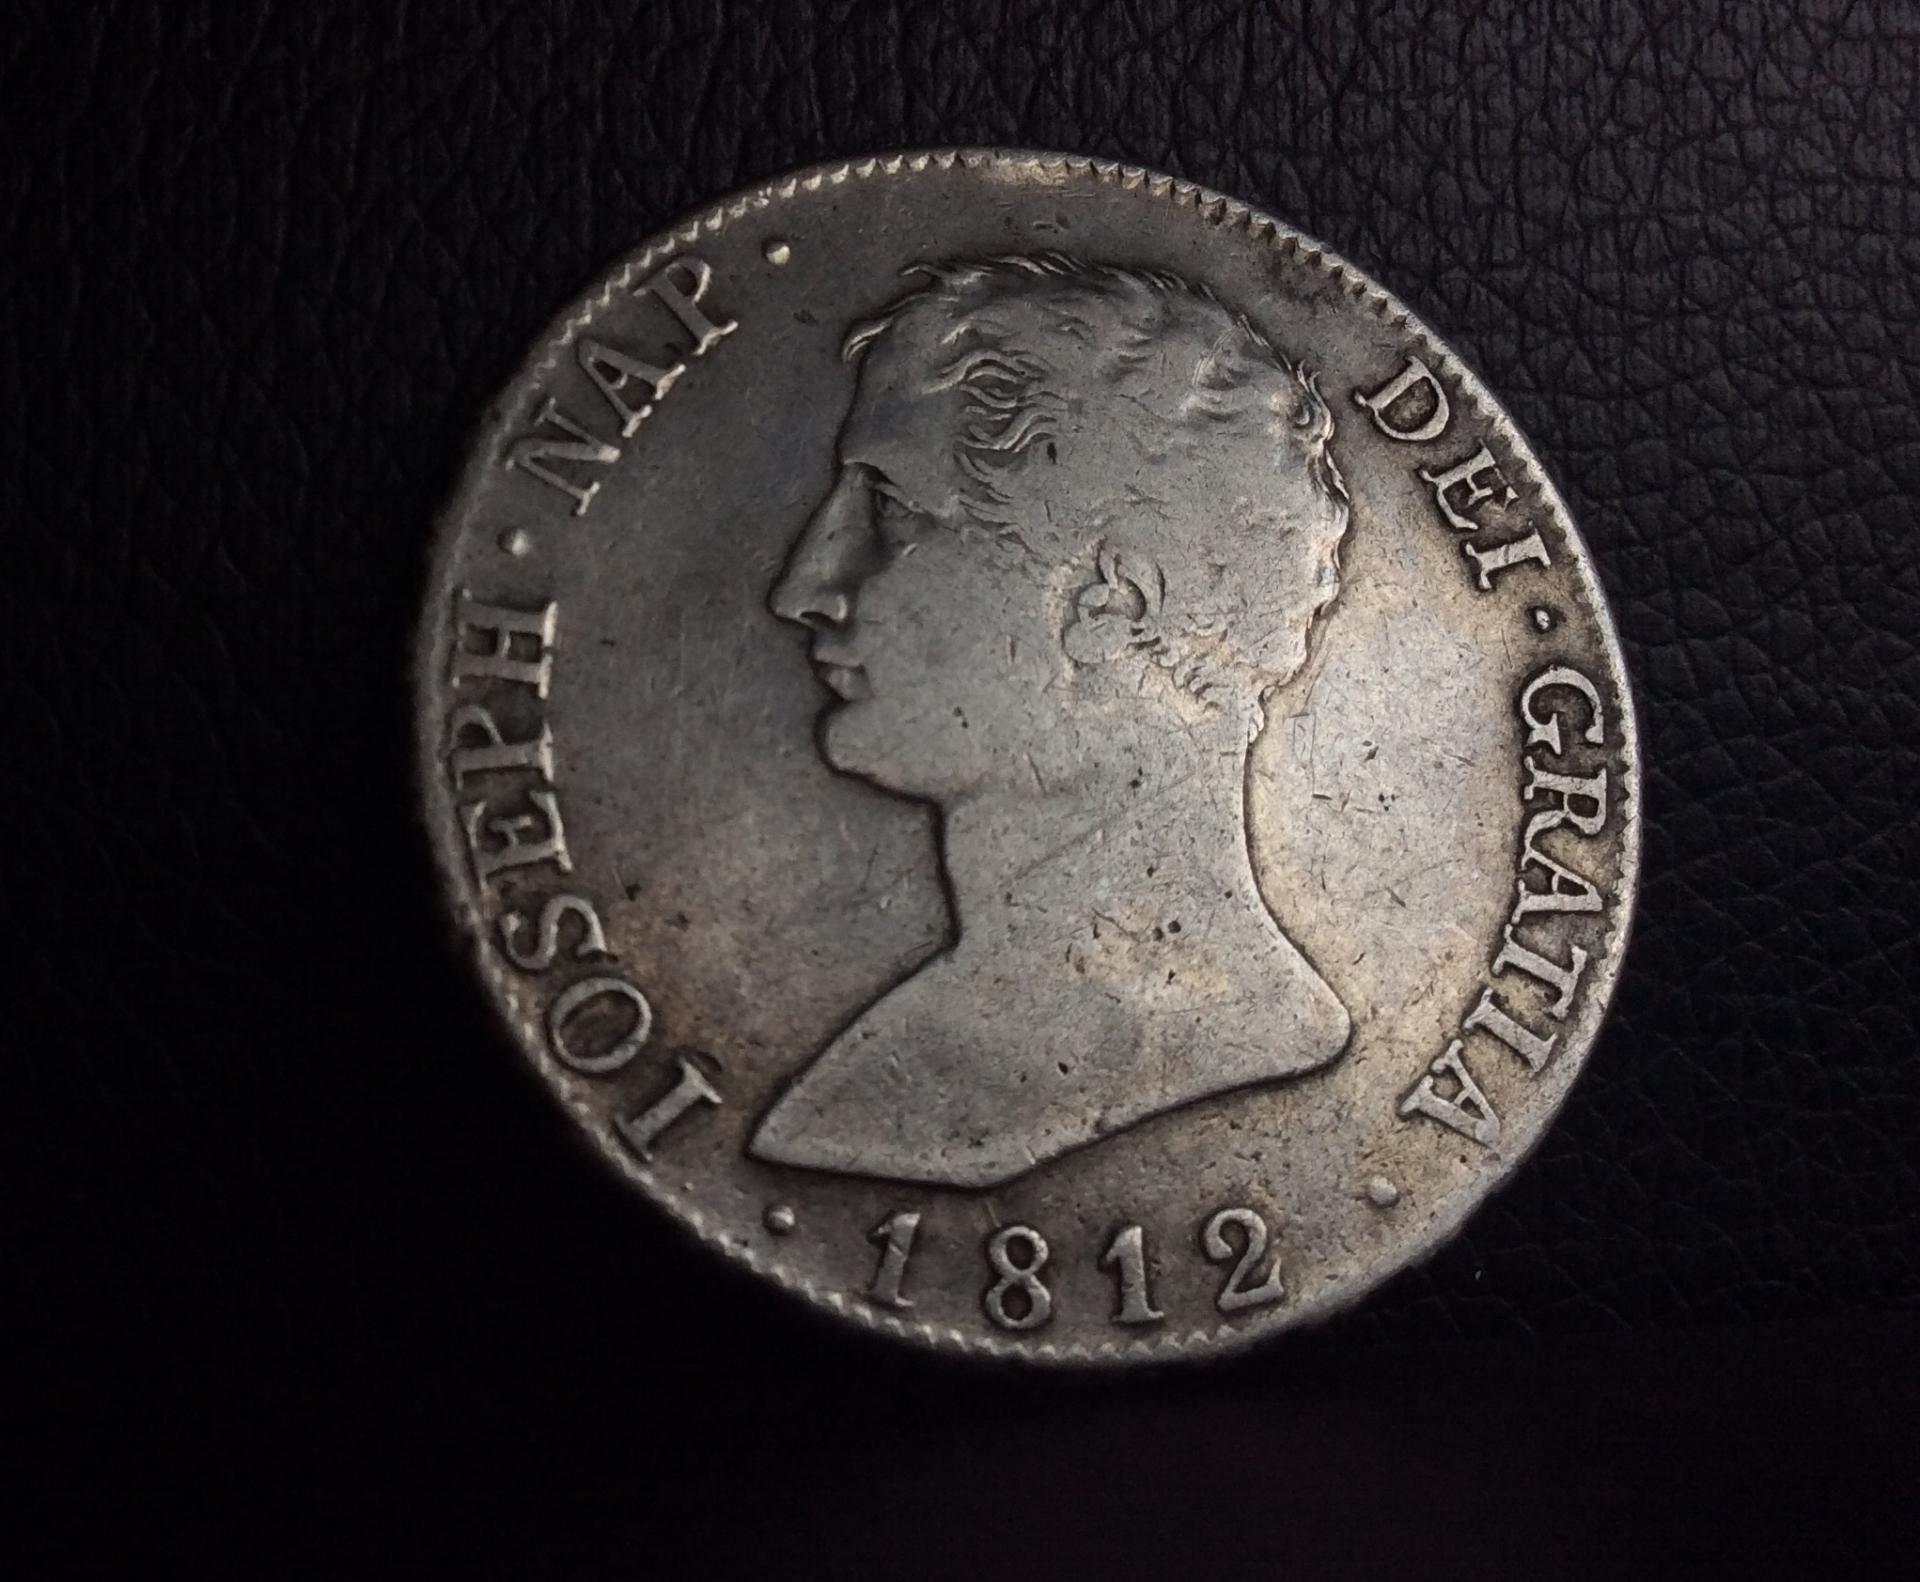 20 REALES 1812 - JOSE I NAPOLEON BONAPARTE - MADRID AI